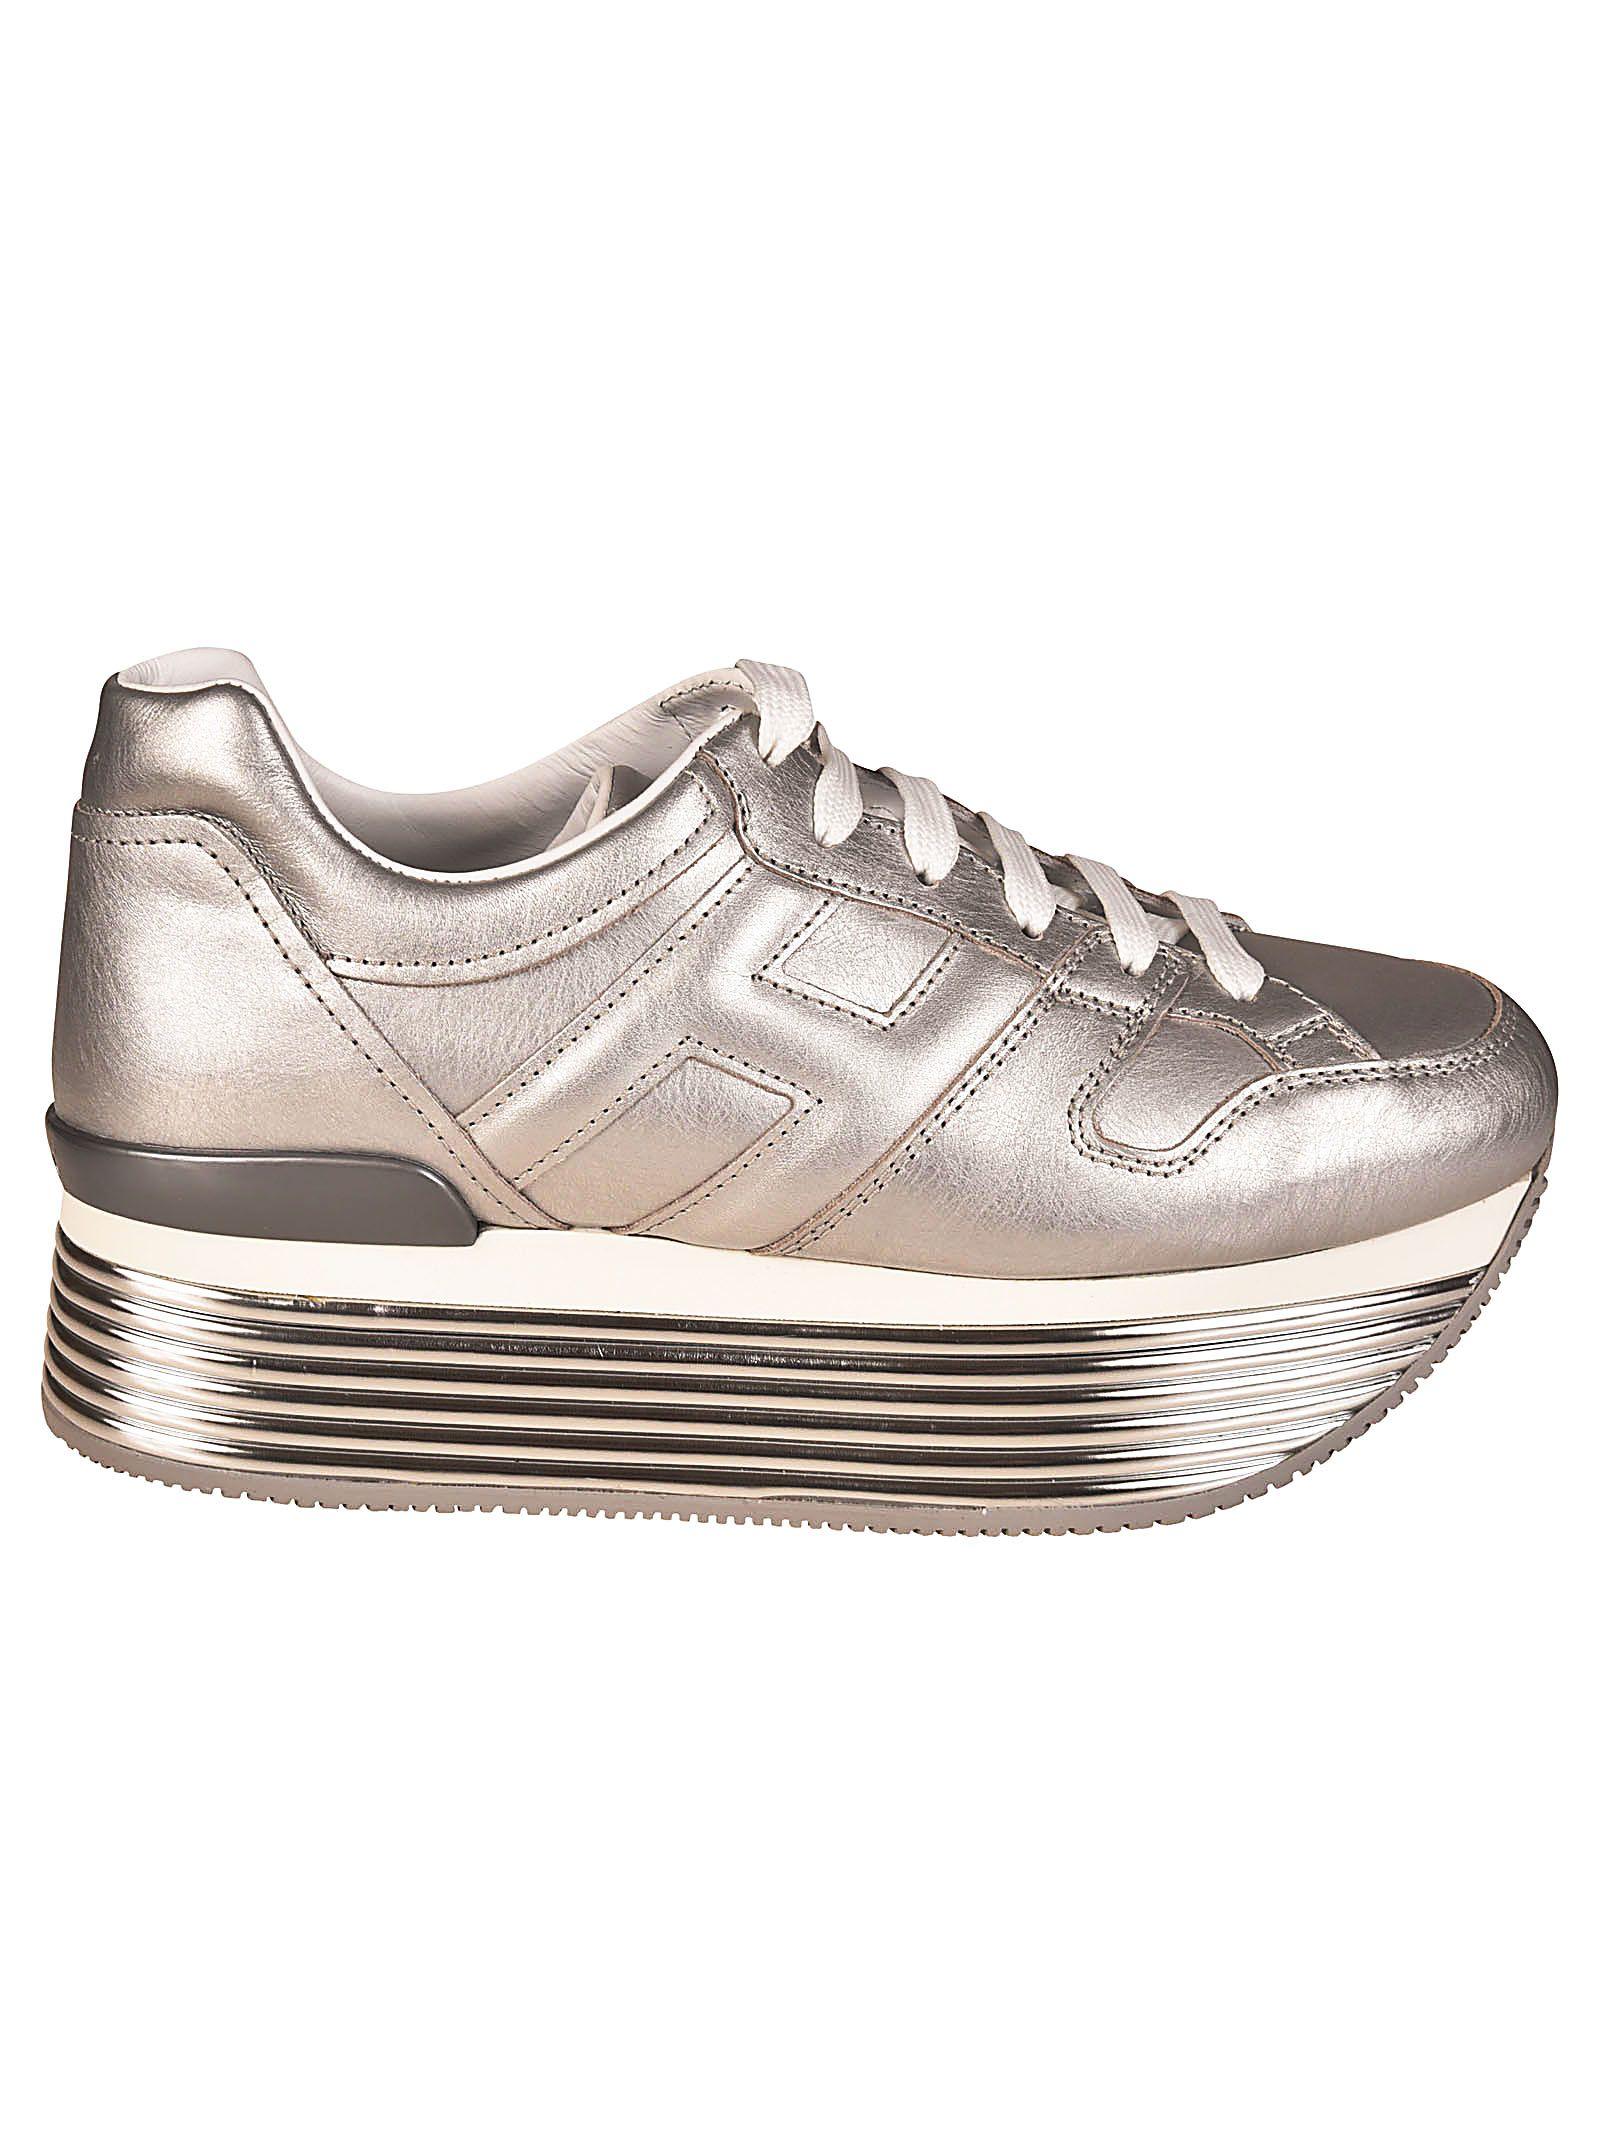 Cheap Sale Visa Payment Hogan Platform H Sneakers Online Sale Supply Visa Payment Sale Online Clearance Good Selling V9zBo1